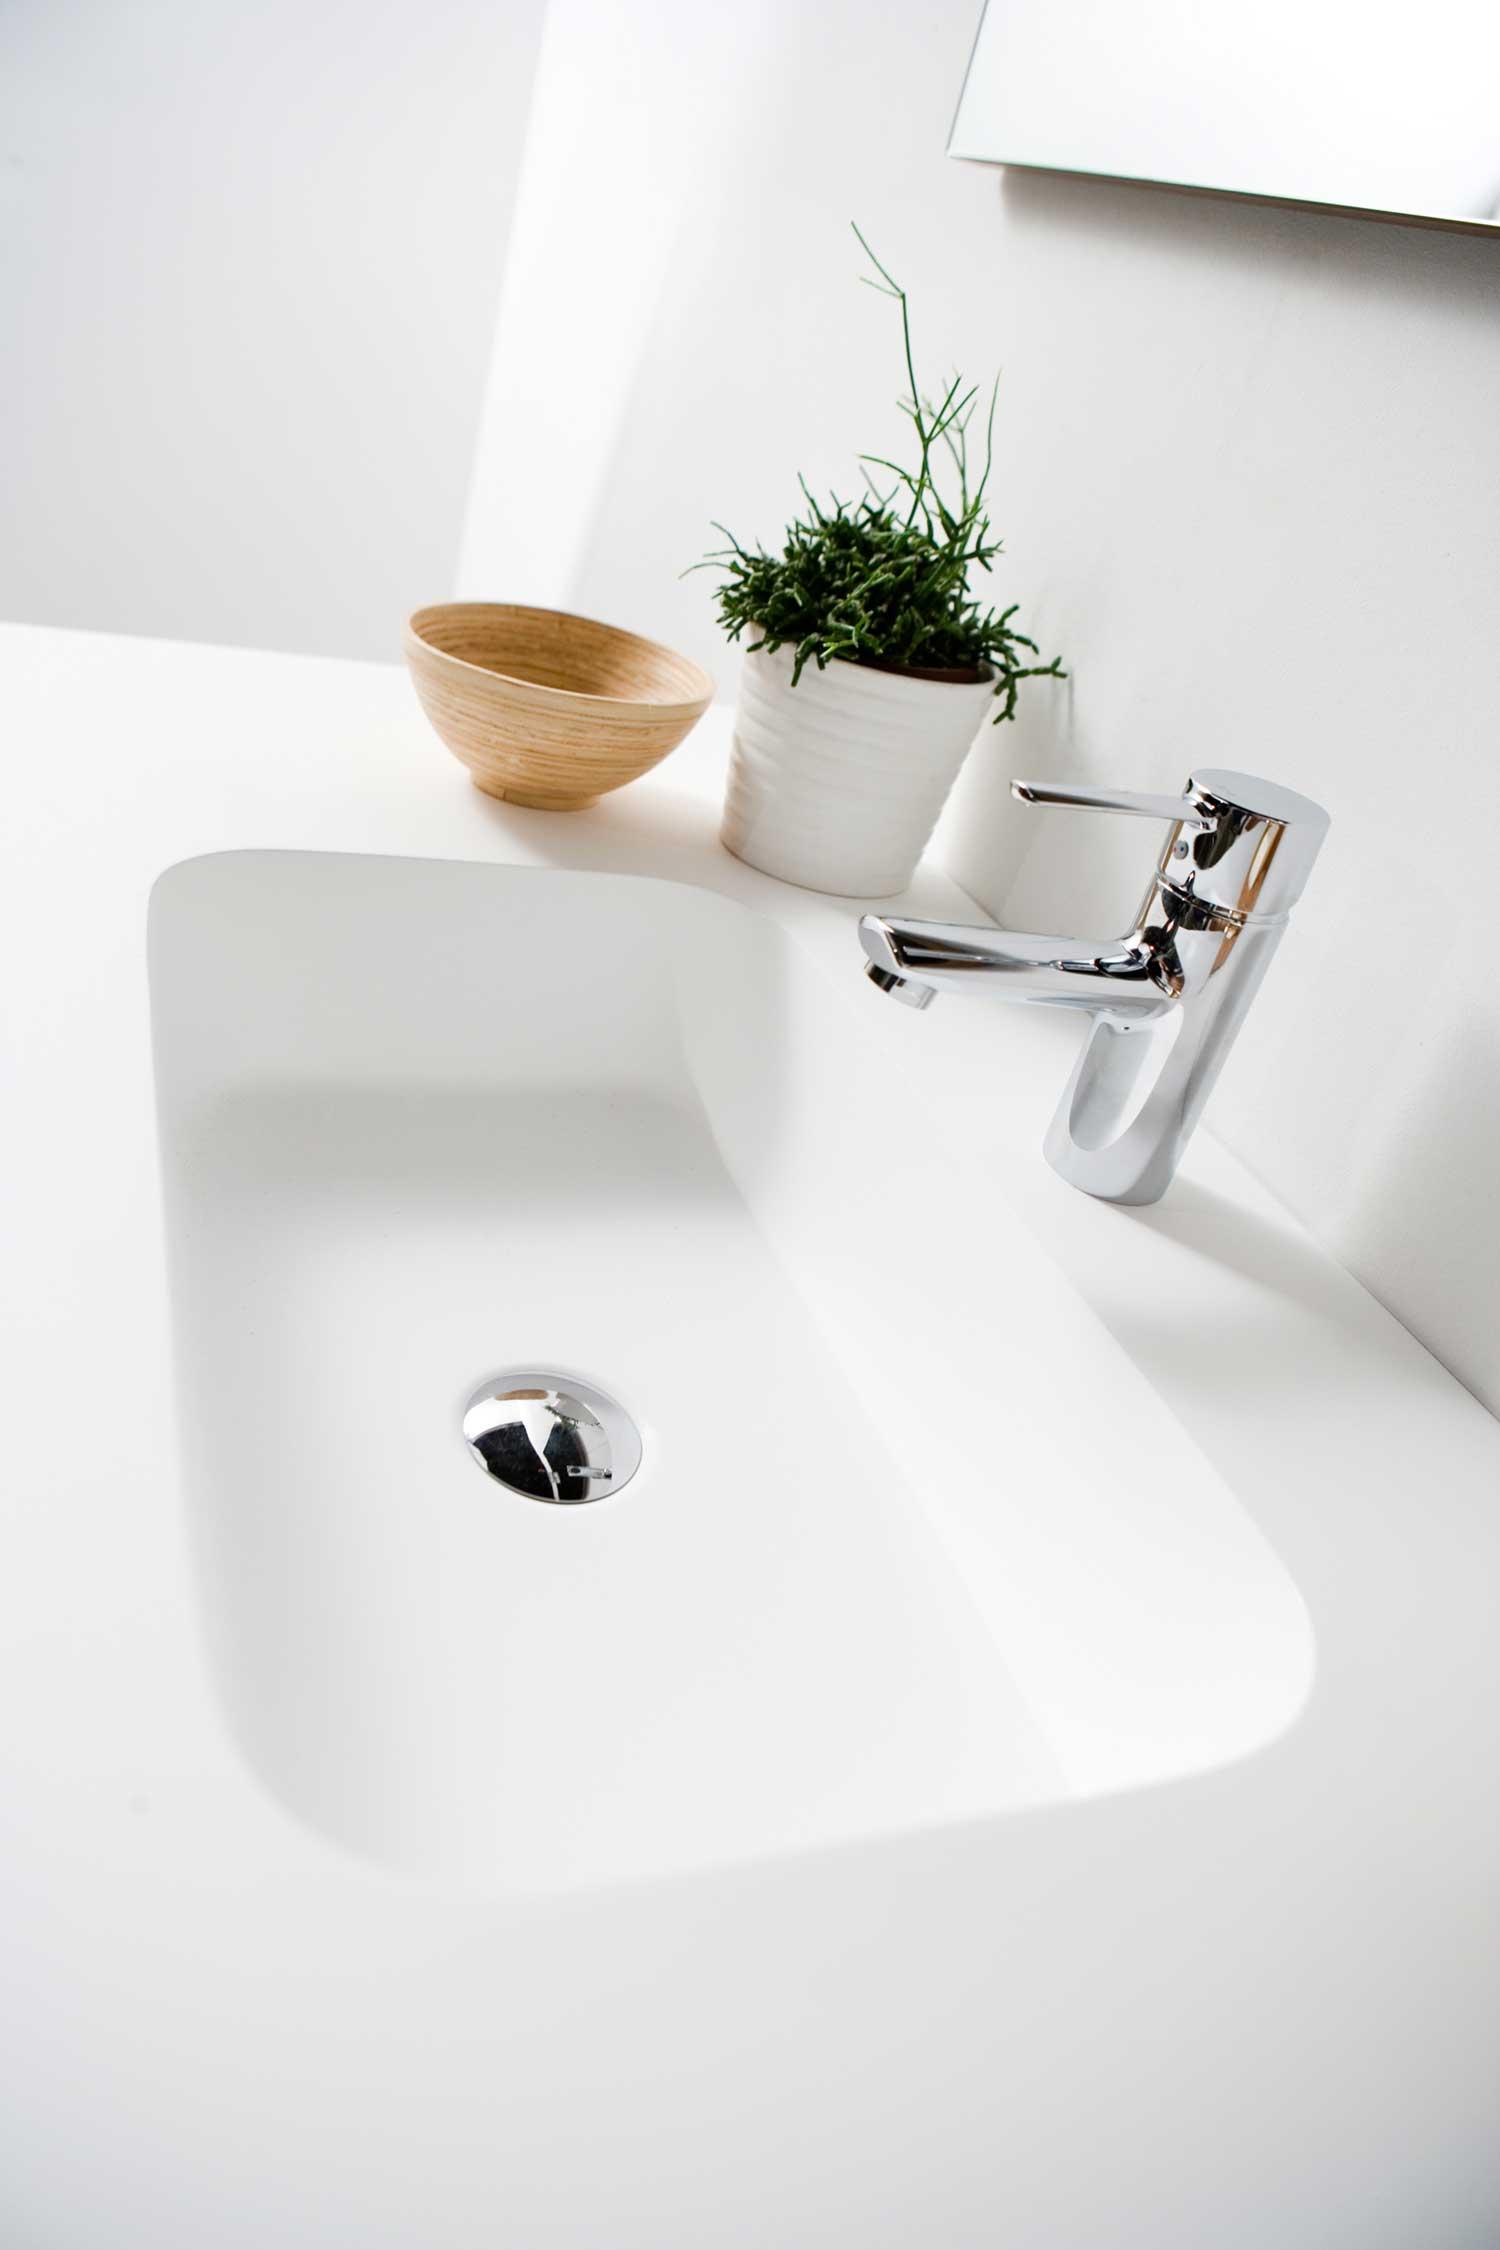 Plan Vasque Sur Mesure plan vasque sur mesure (1 bac) gel coat 2 cm b10